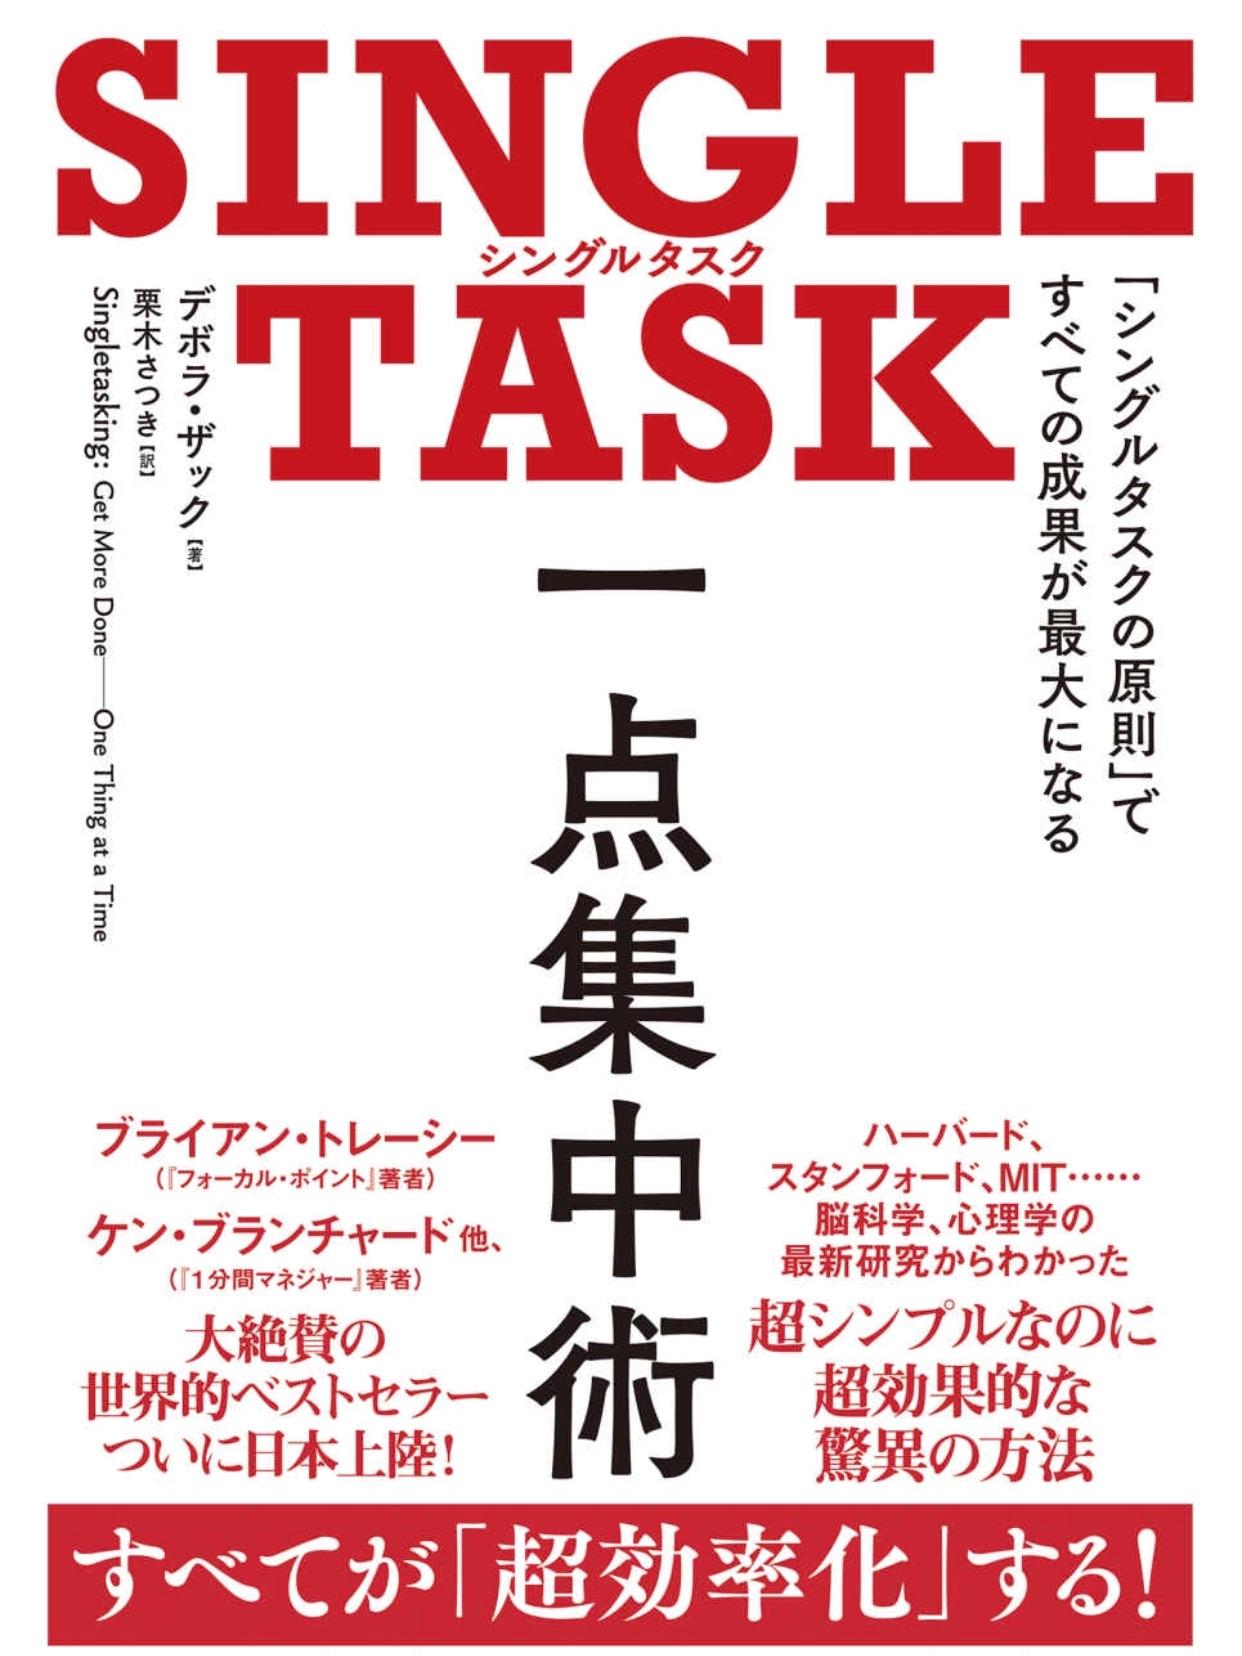 SINGLE TASK 一点集中術――「シングルタスクの原則」ですべての成果が最大になる。今年はこれを意識していきます!